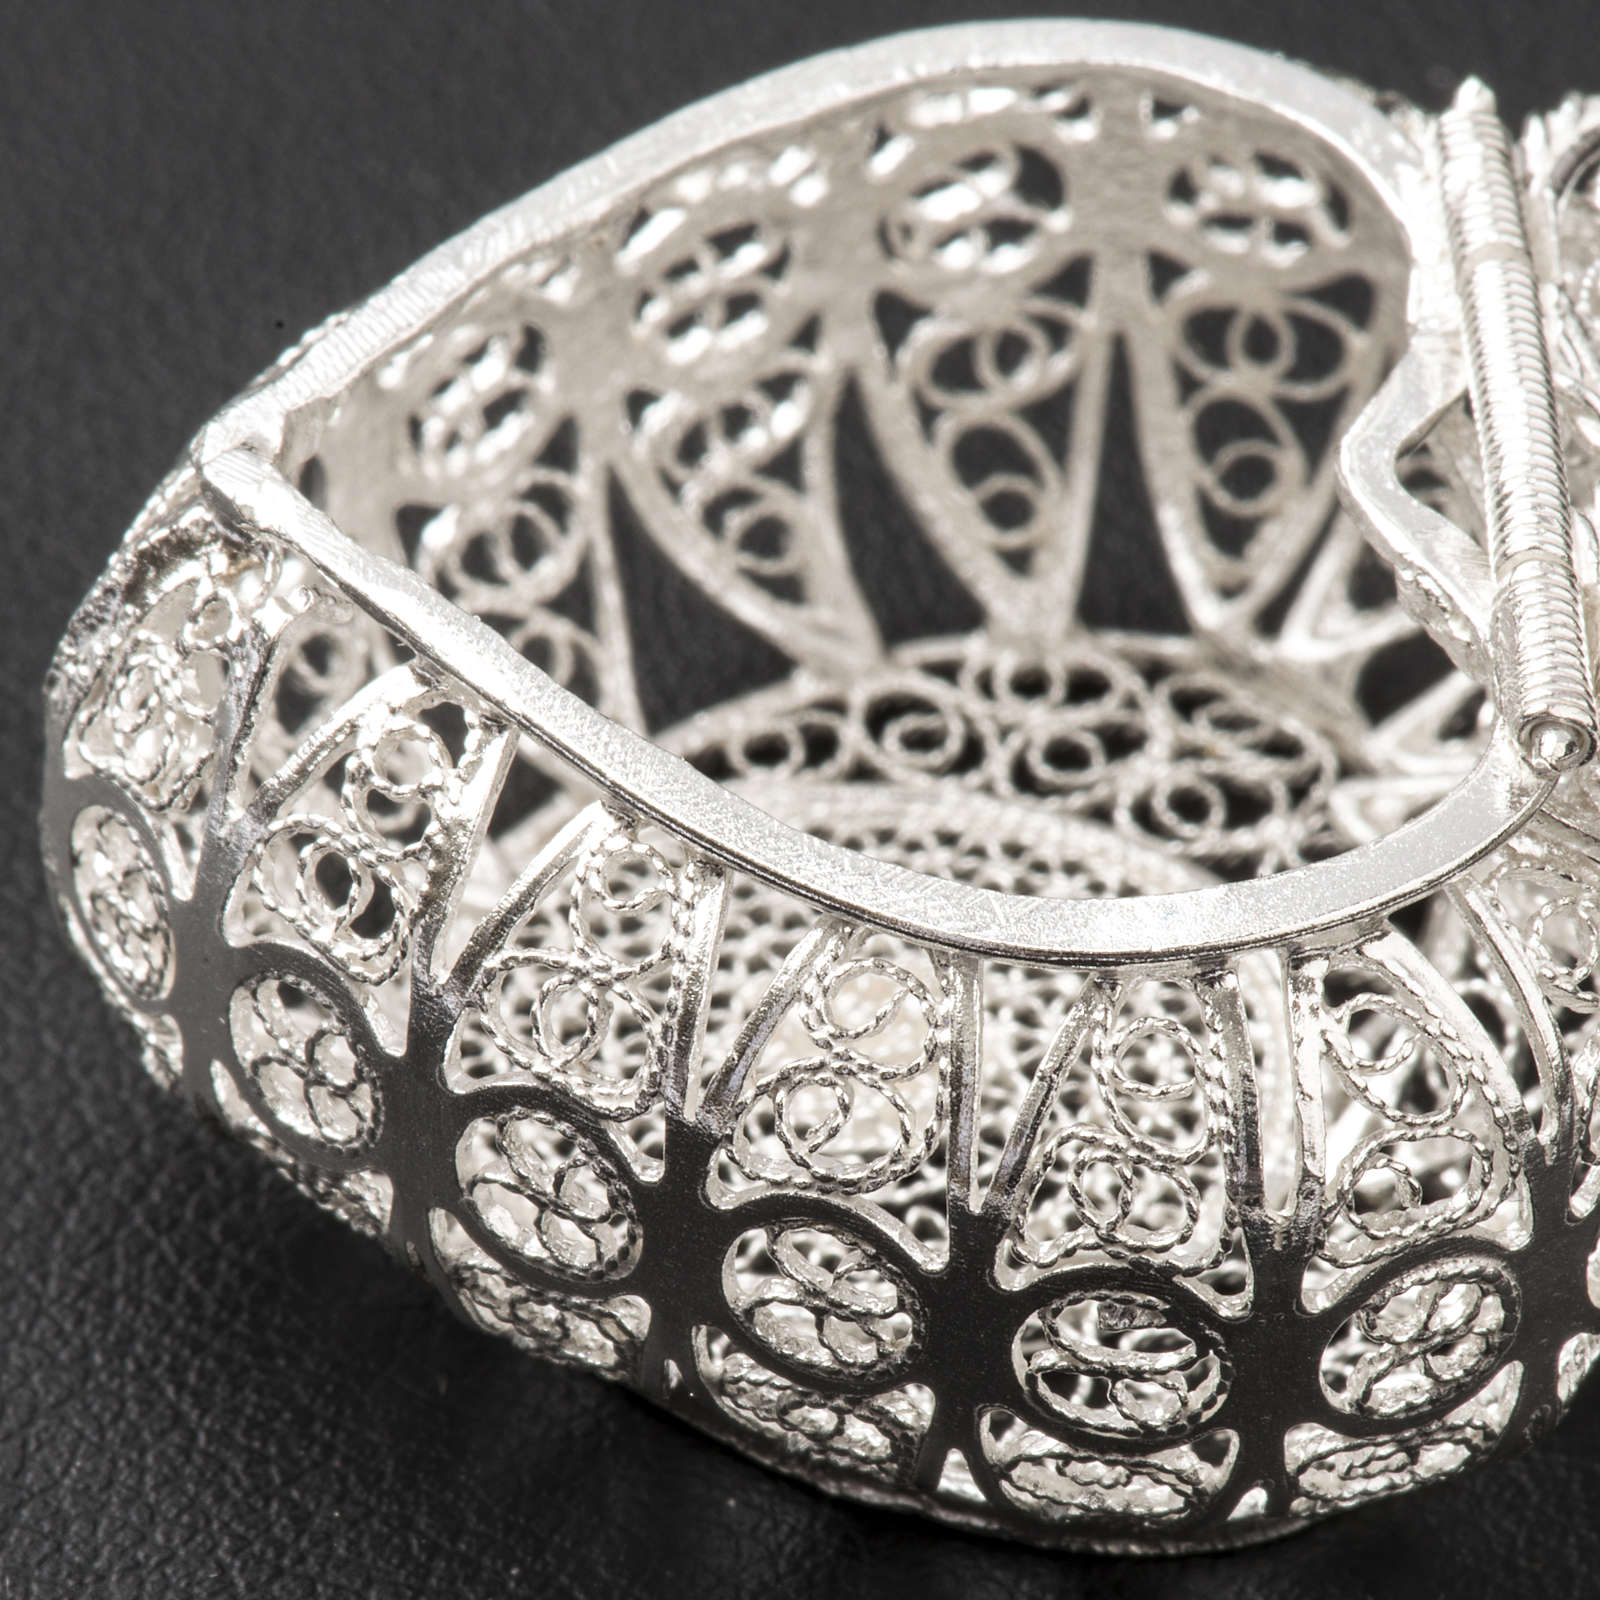 Portarosario cuore argento 800 filigrana 4